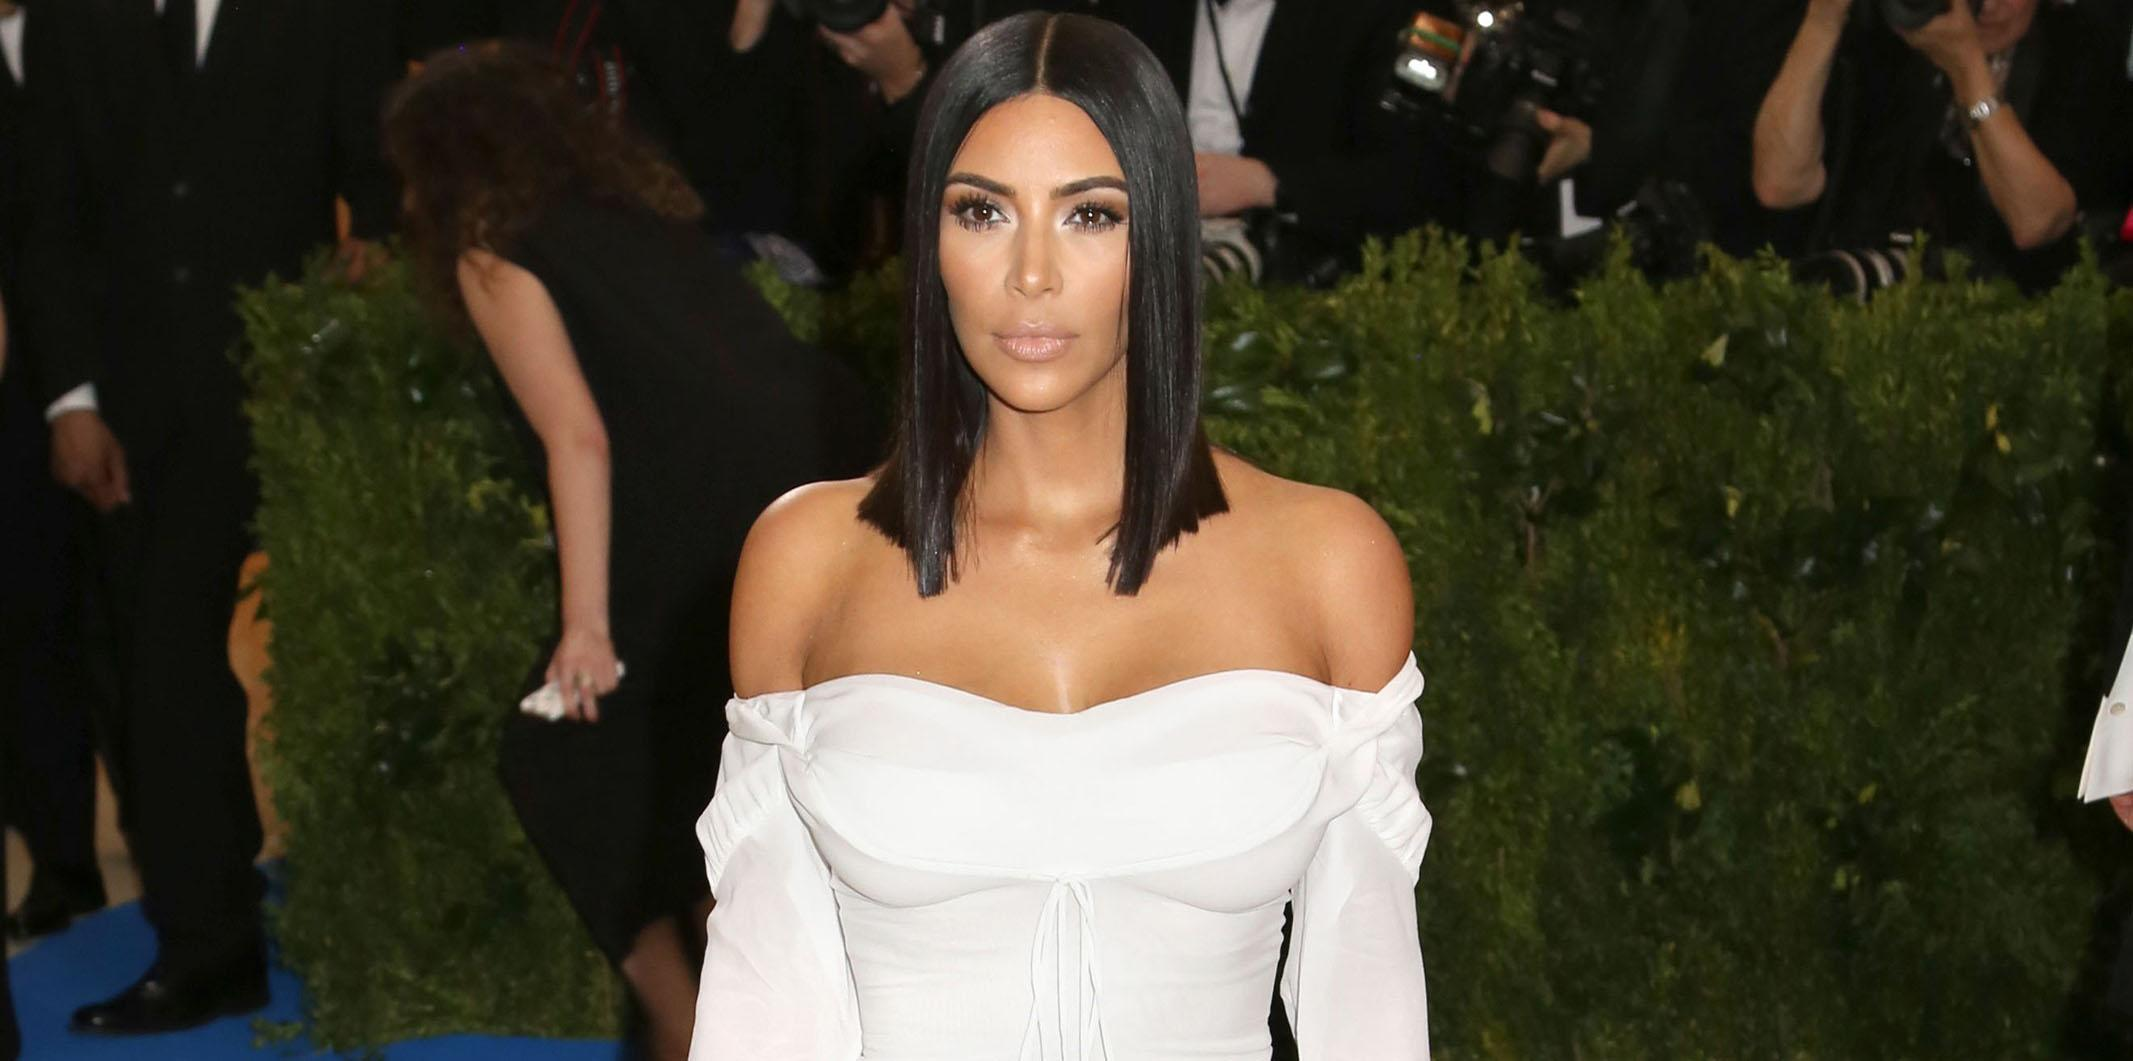 Kim Kardashian wows in white for the 2017 Met Gala